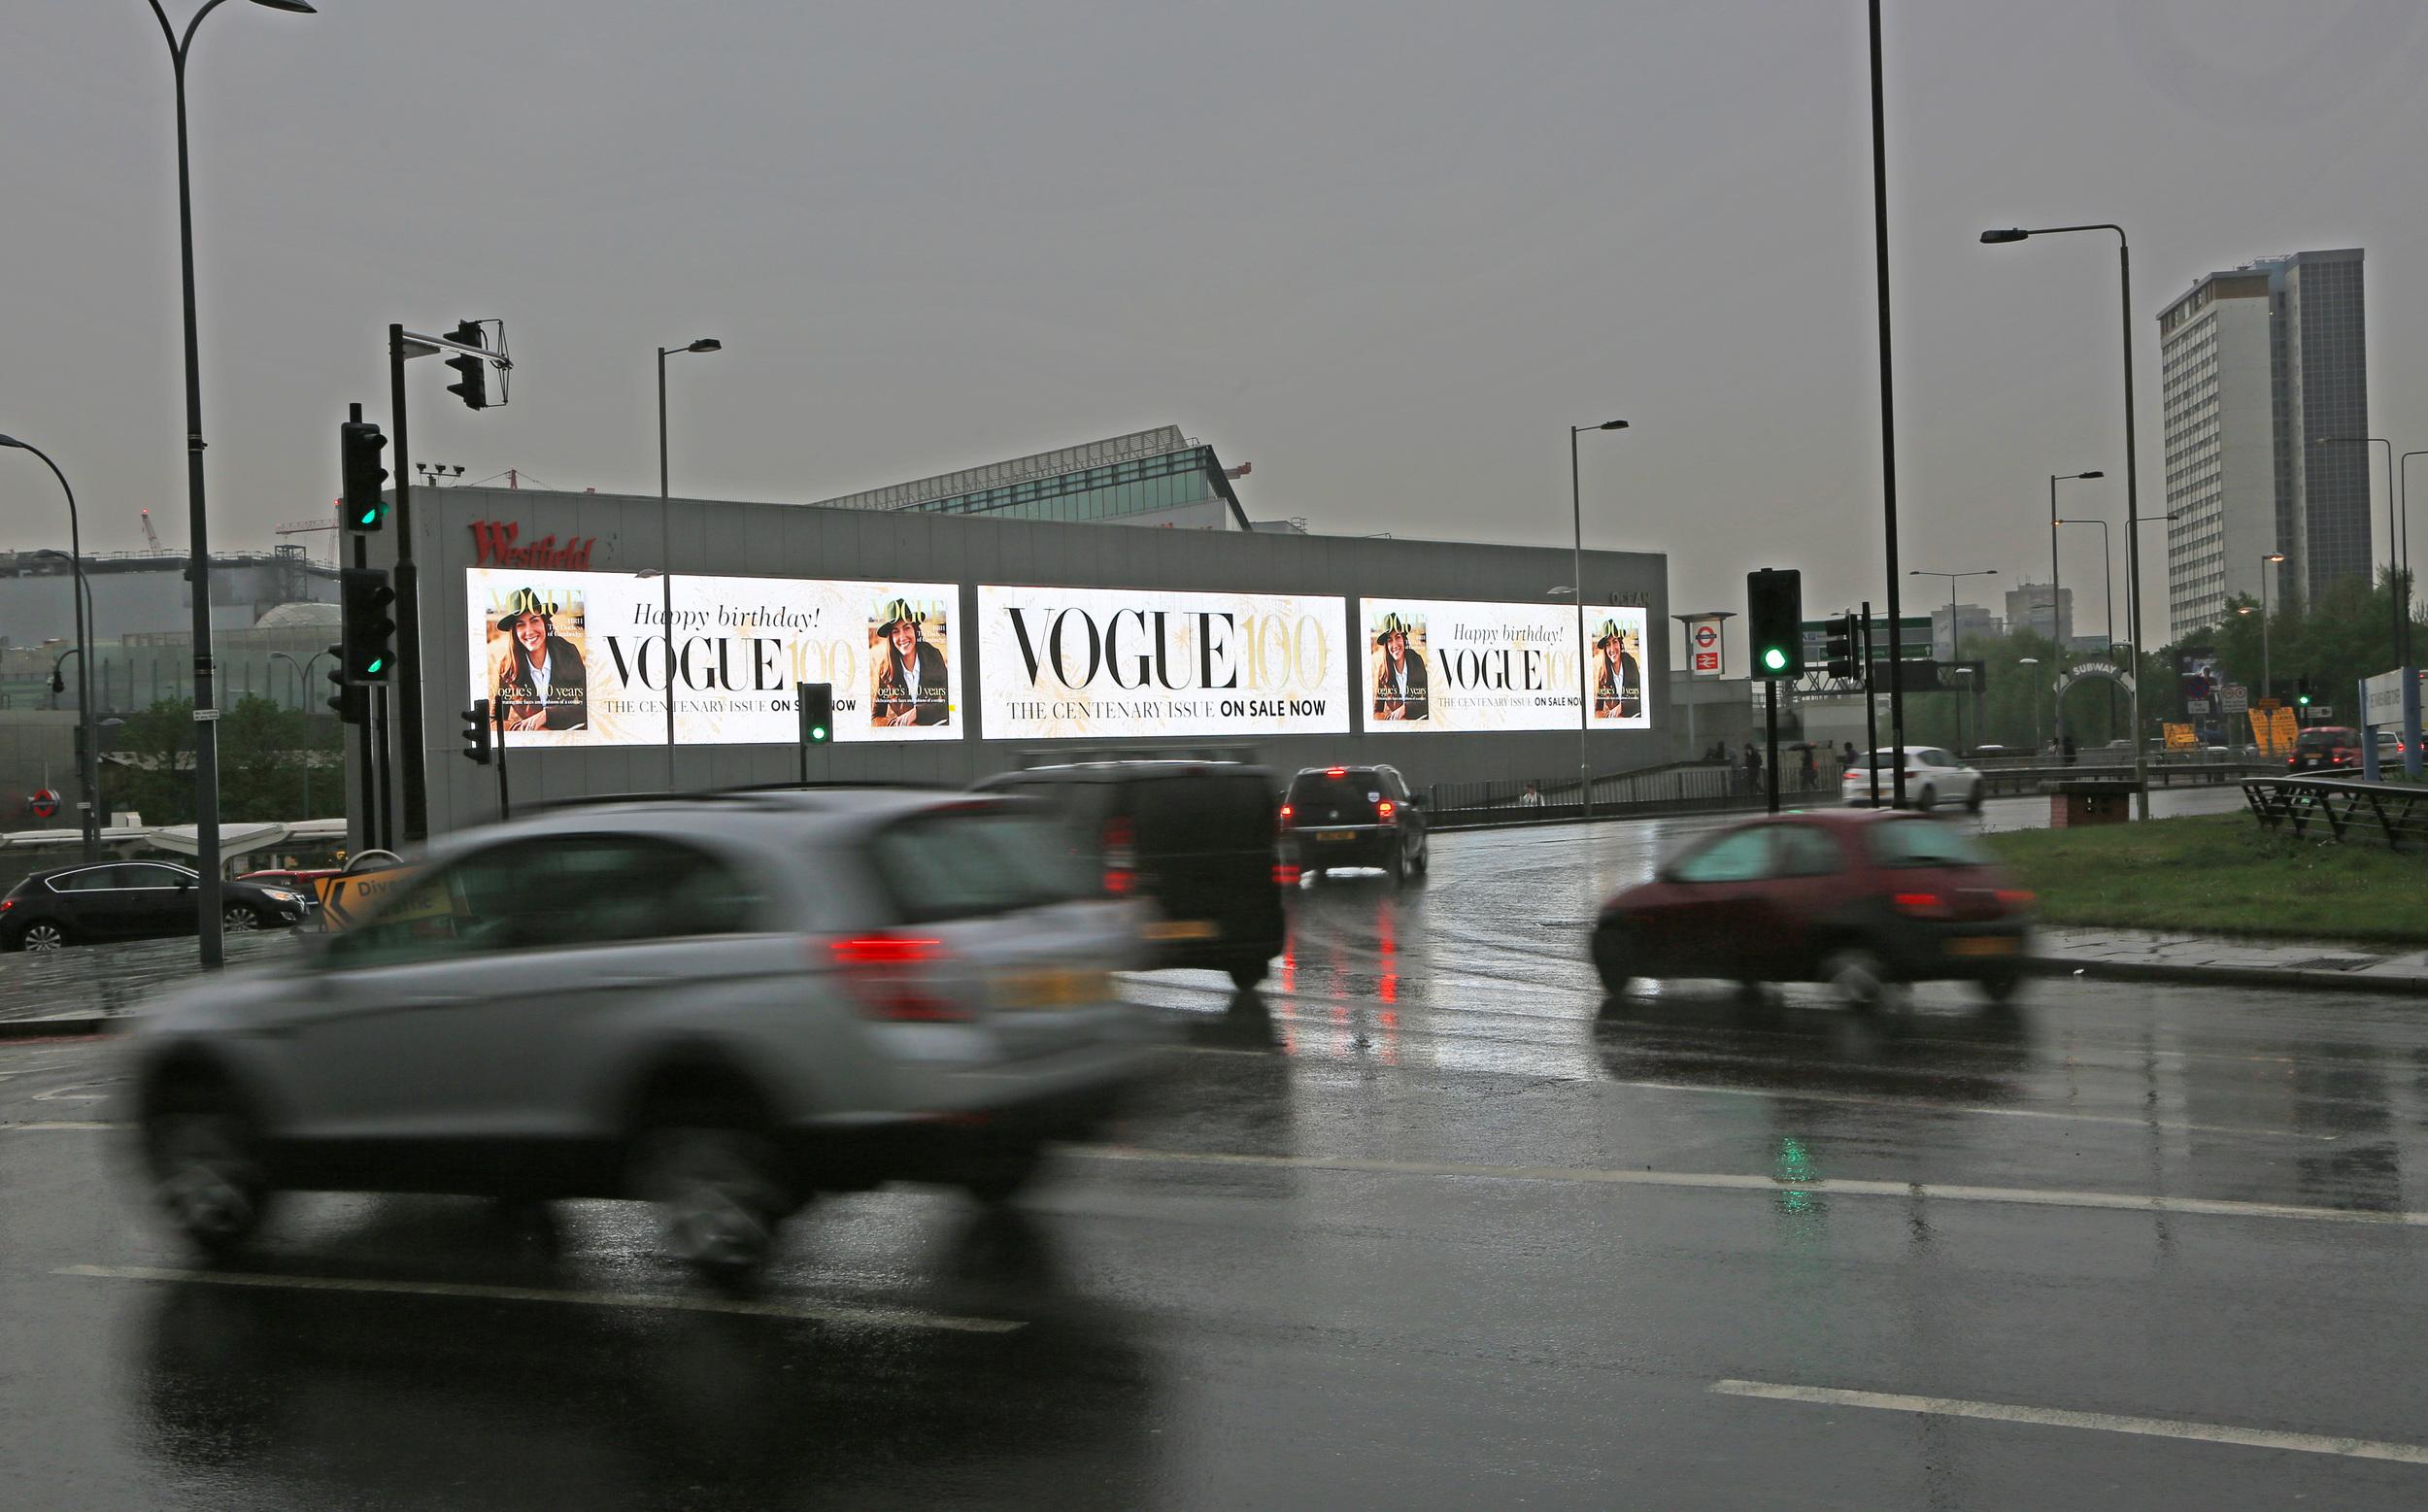 British Vogue - The Centenary Issue